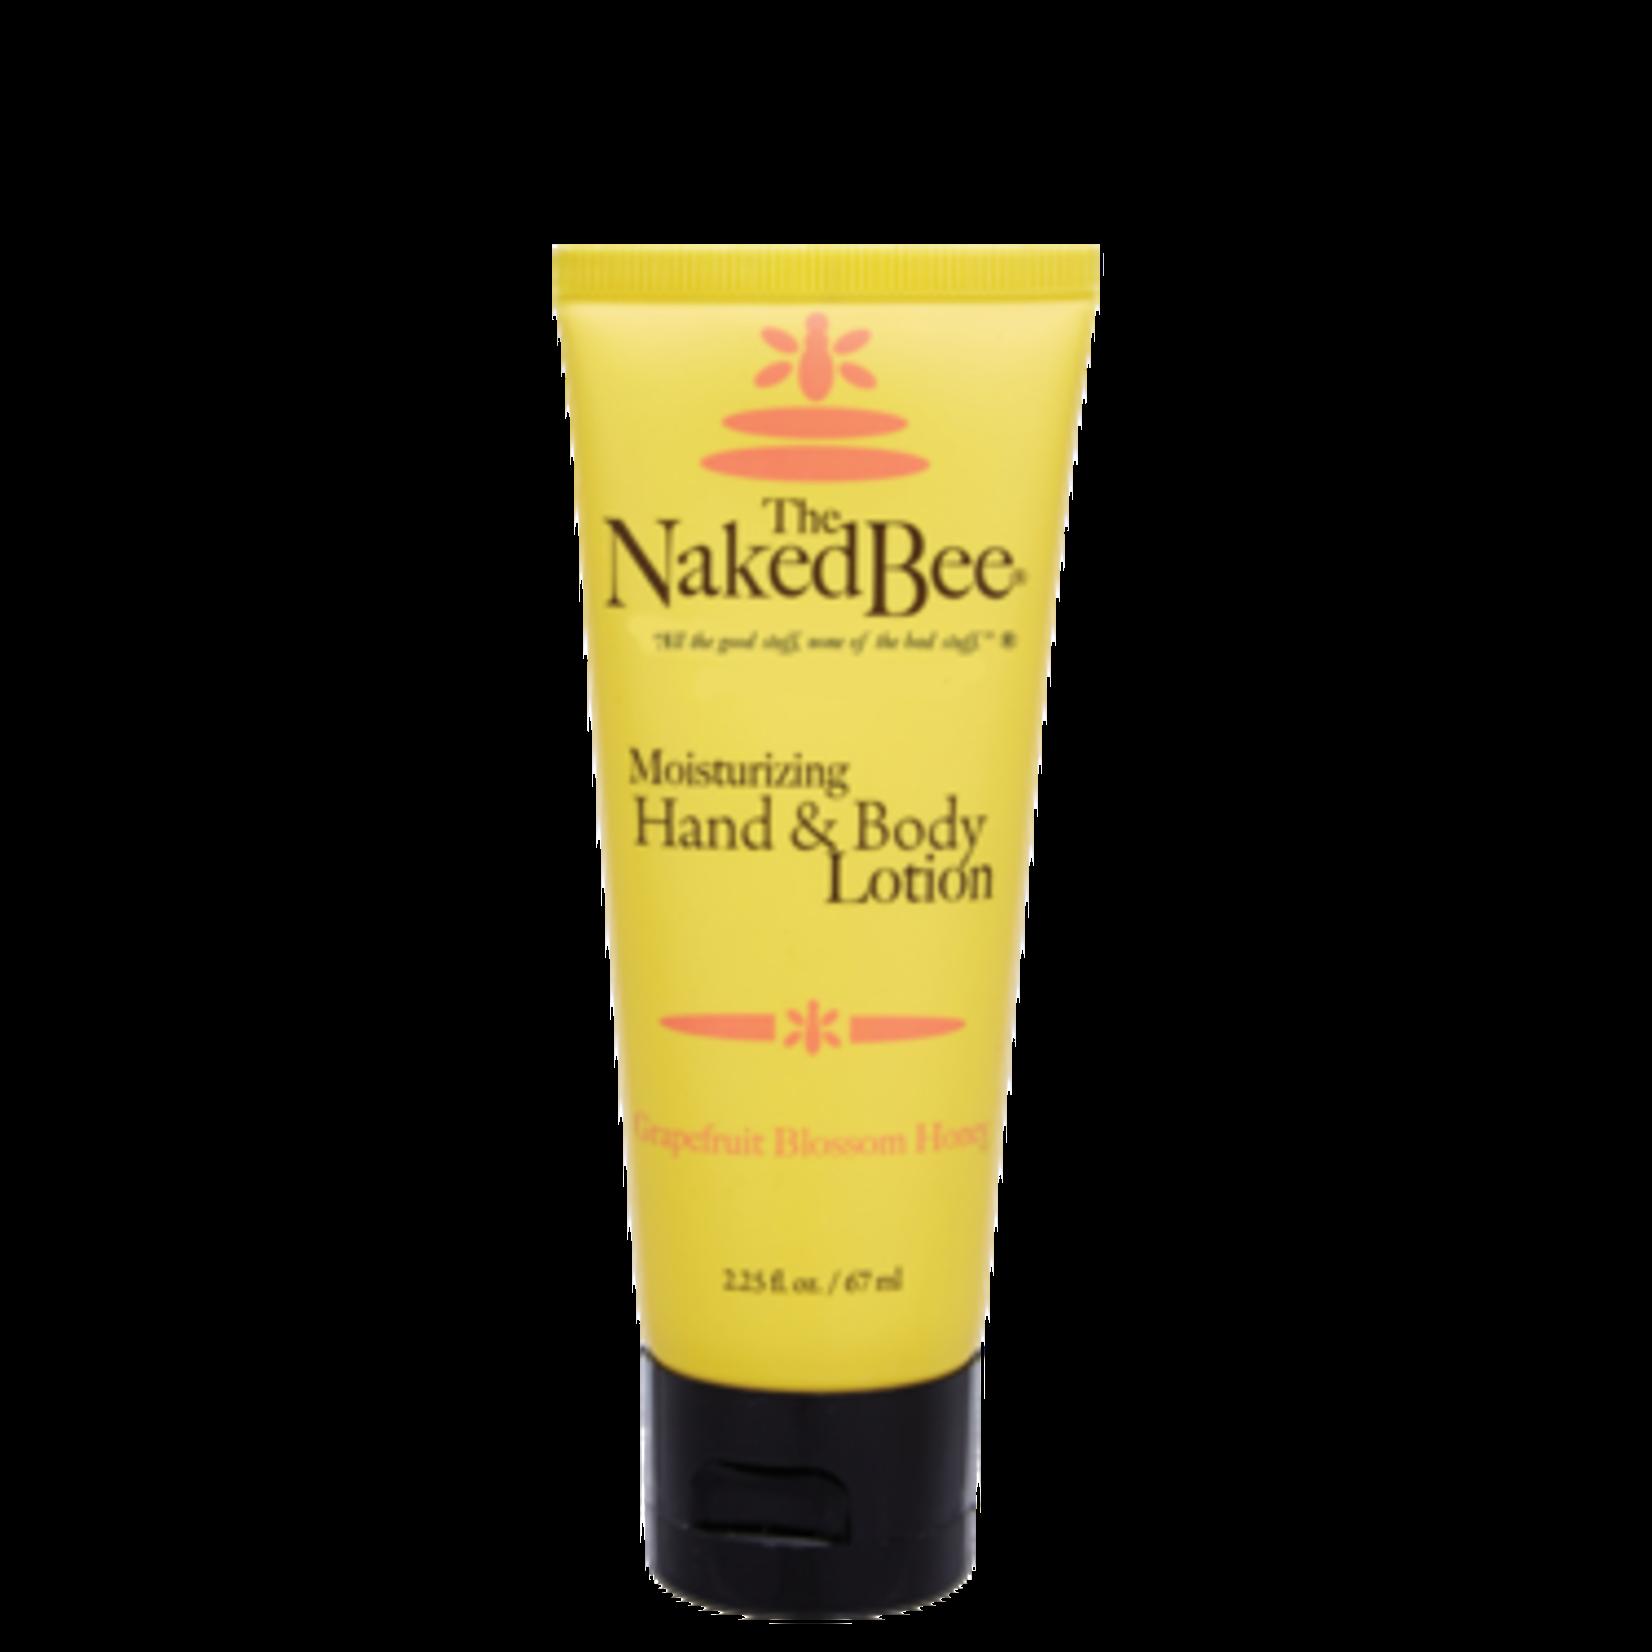 Naked Bee GRAPEFRUIT BLOSSOM HONEY & HAND LOTION